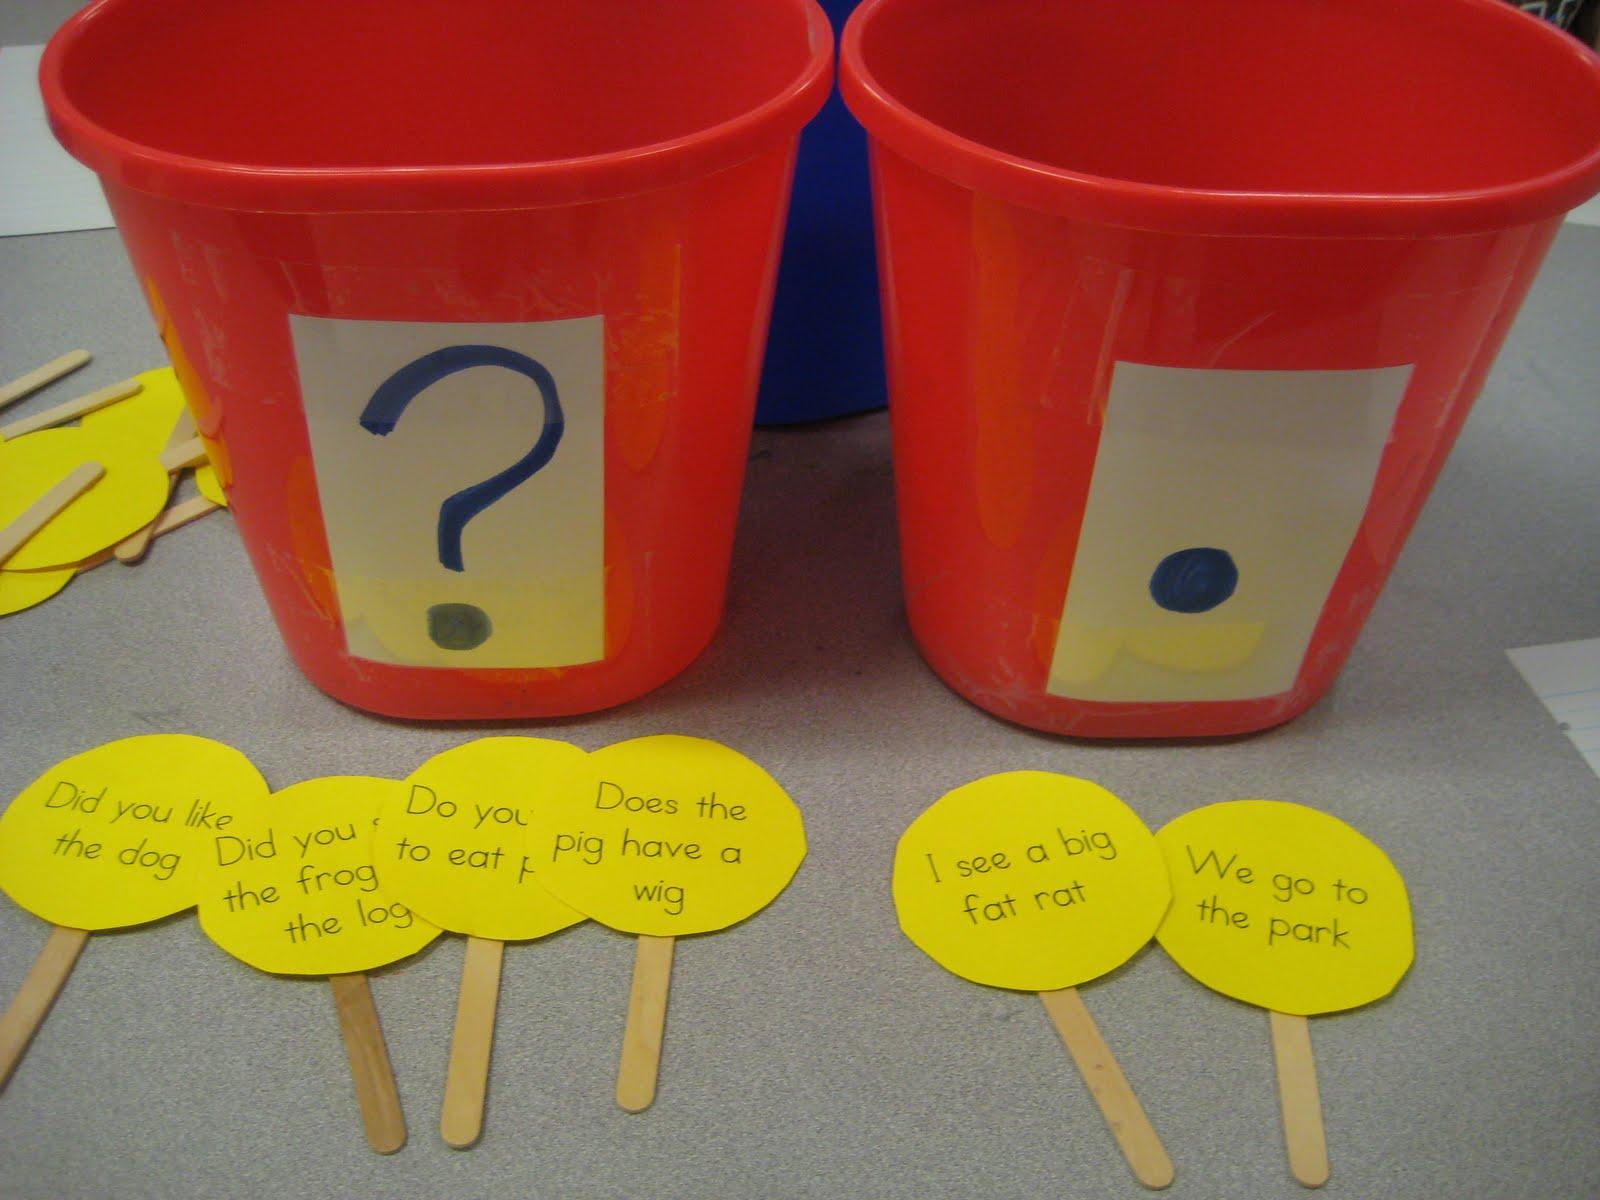 Kinder Garden Period Or Question Mark